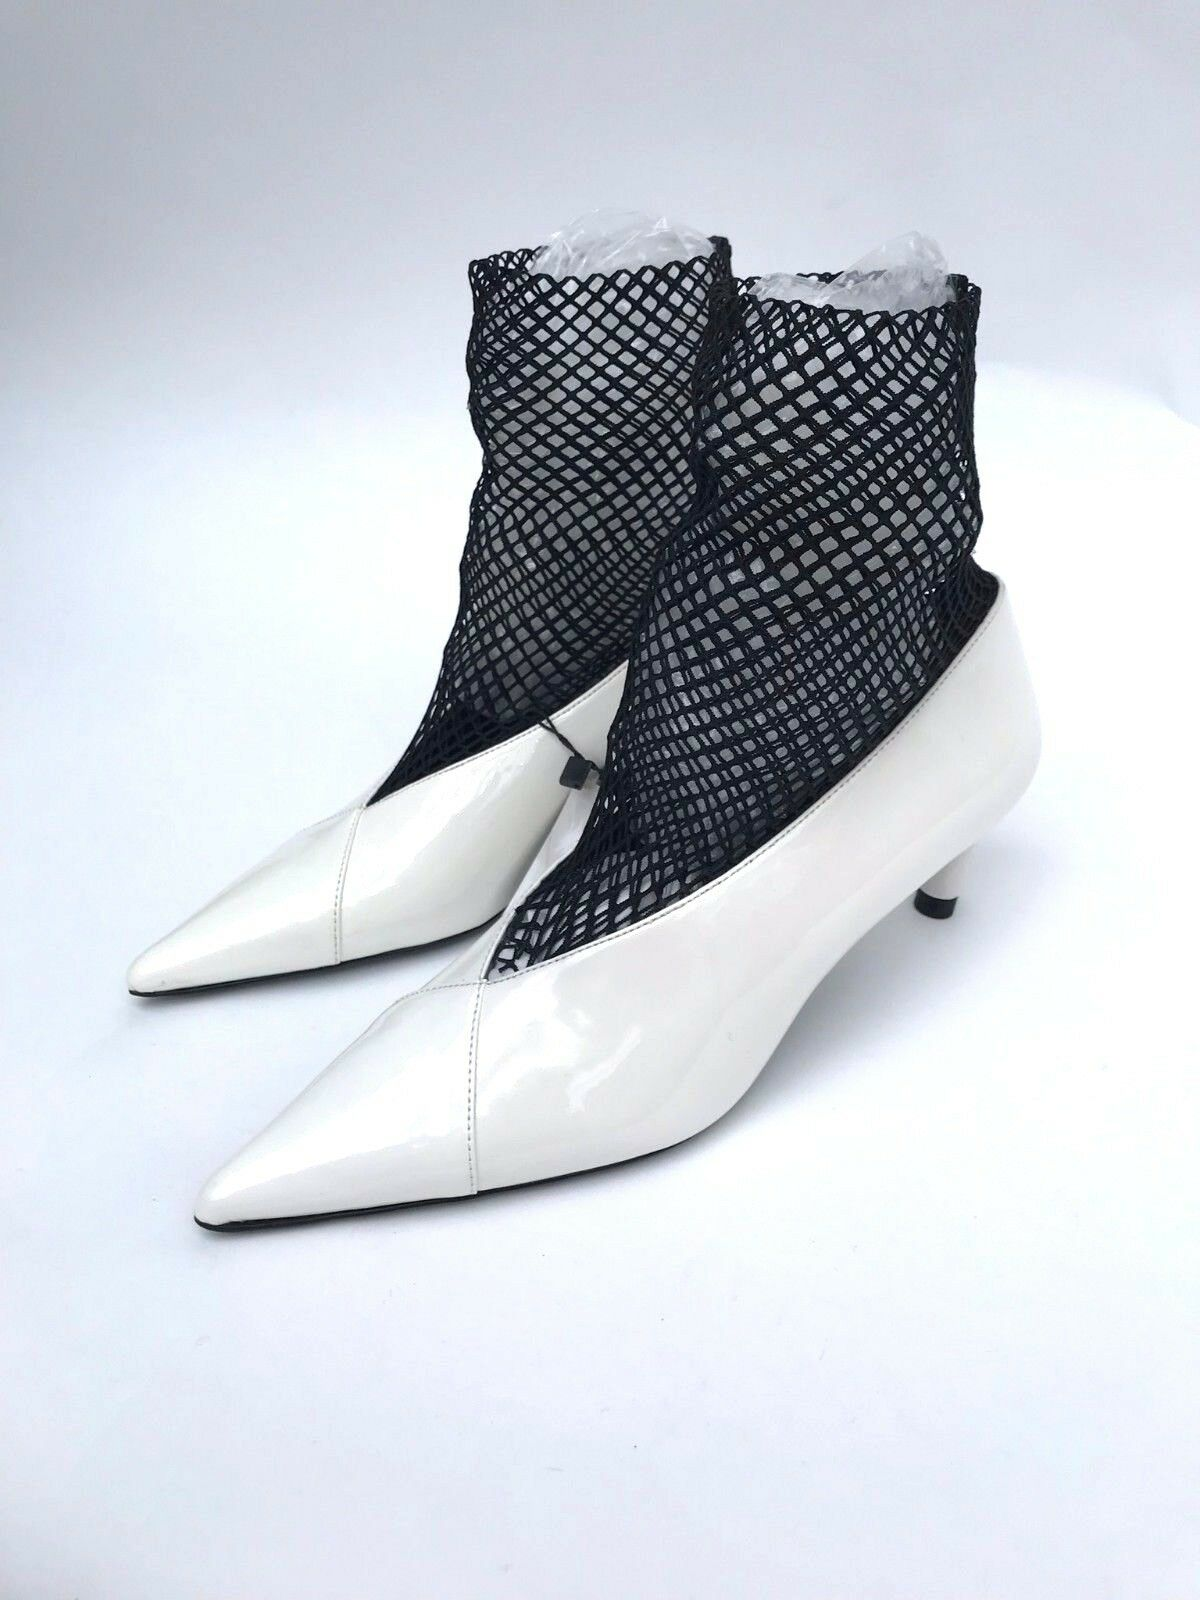 ZARA HEEL Weiß SOCK STYLE HIGH HEEL ZARA COURT Schuhe SIZE UK5 EUR38 US7.5 5c2dfc